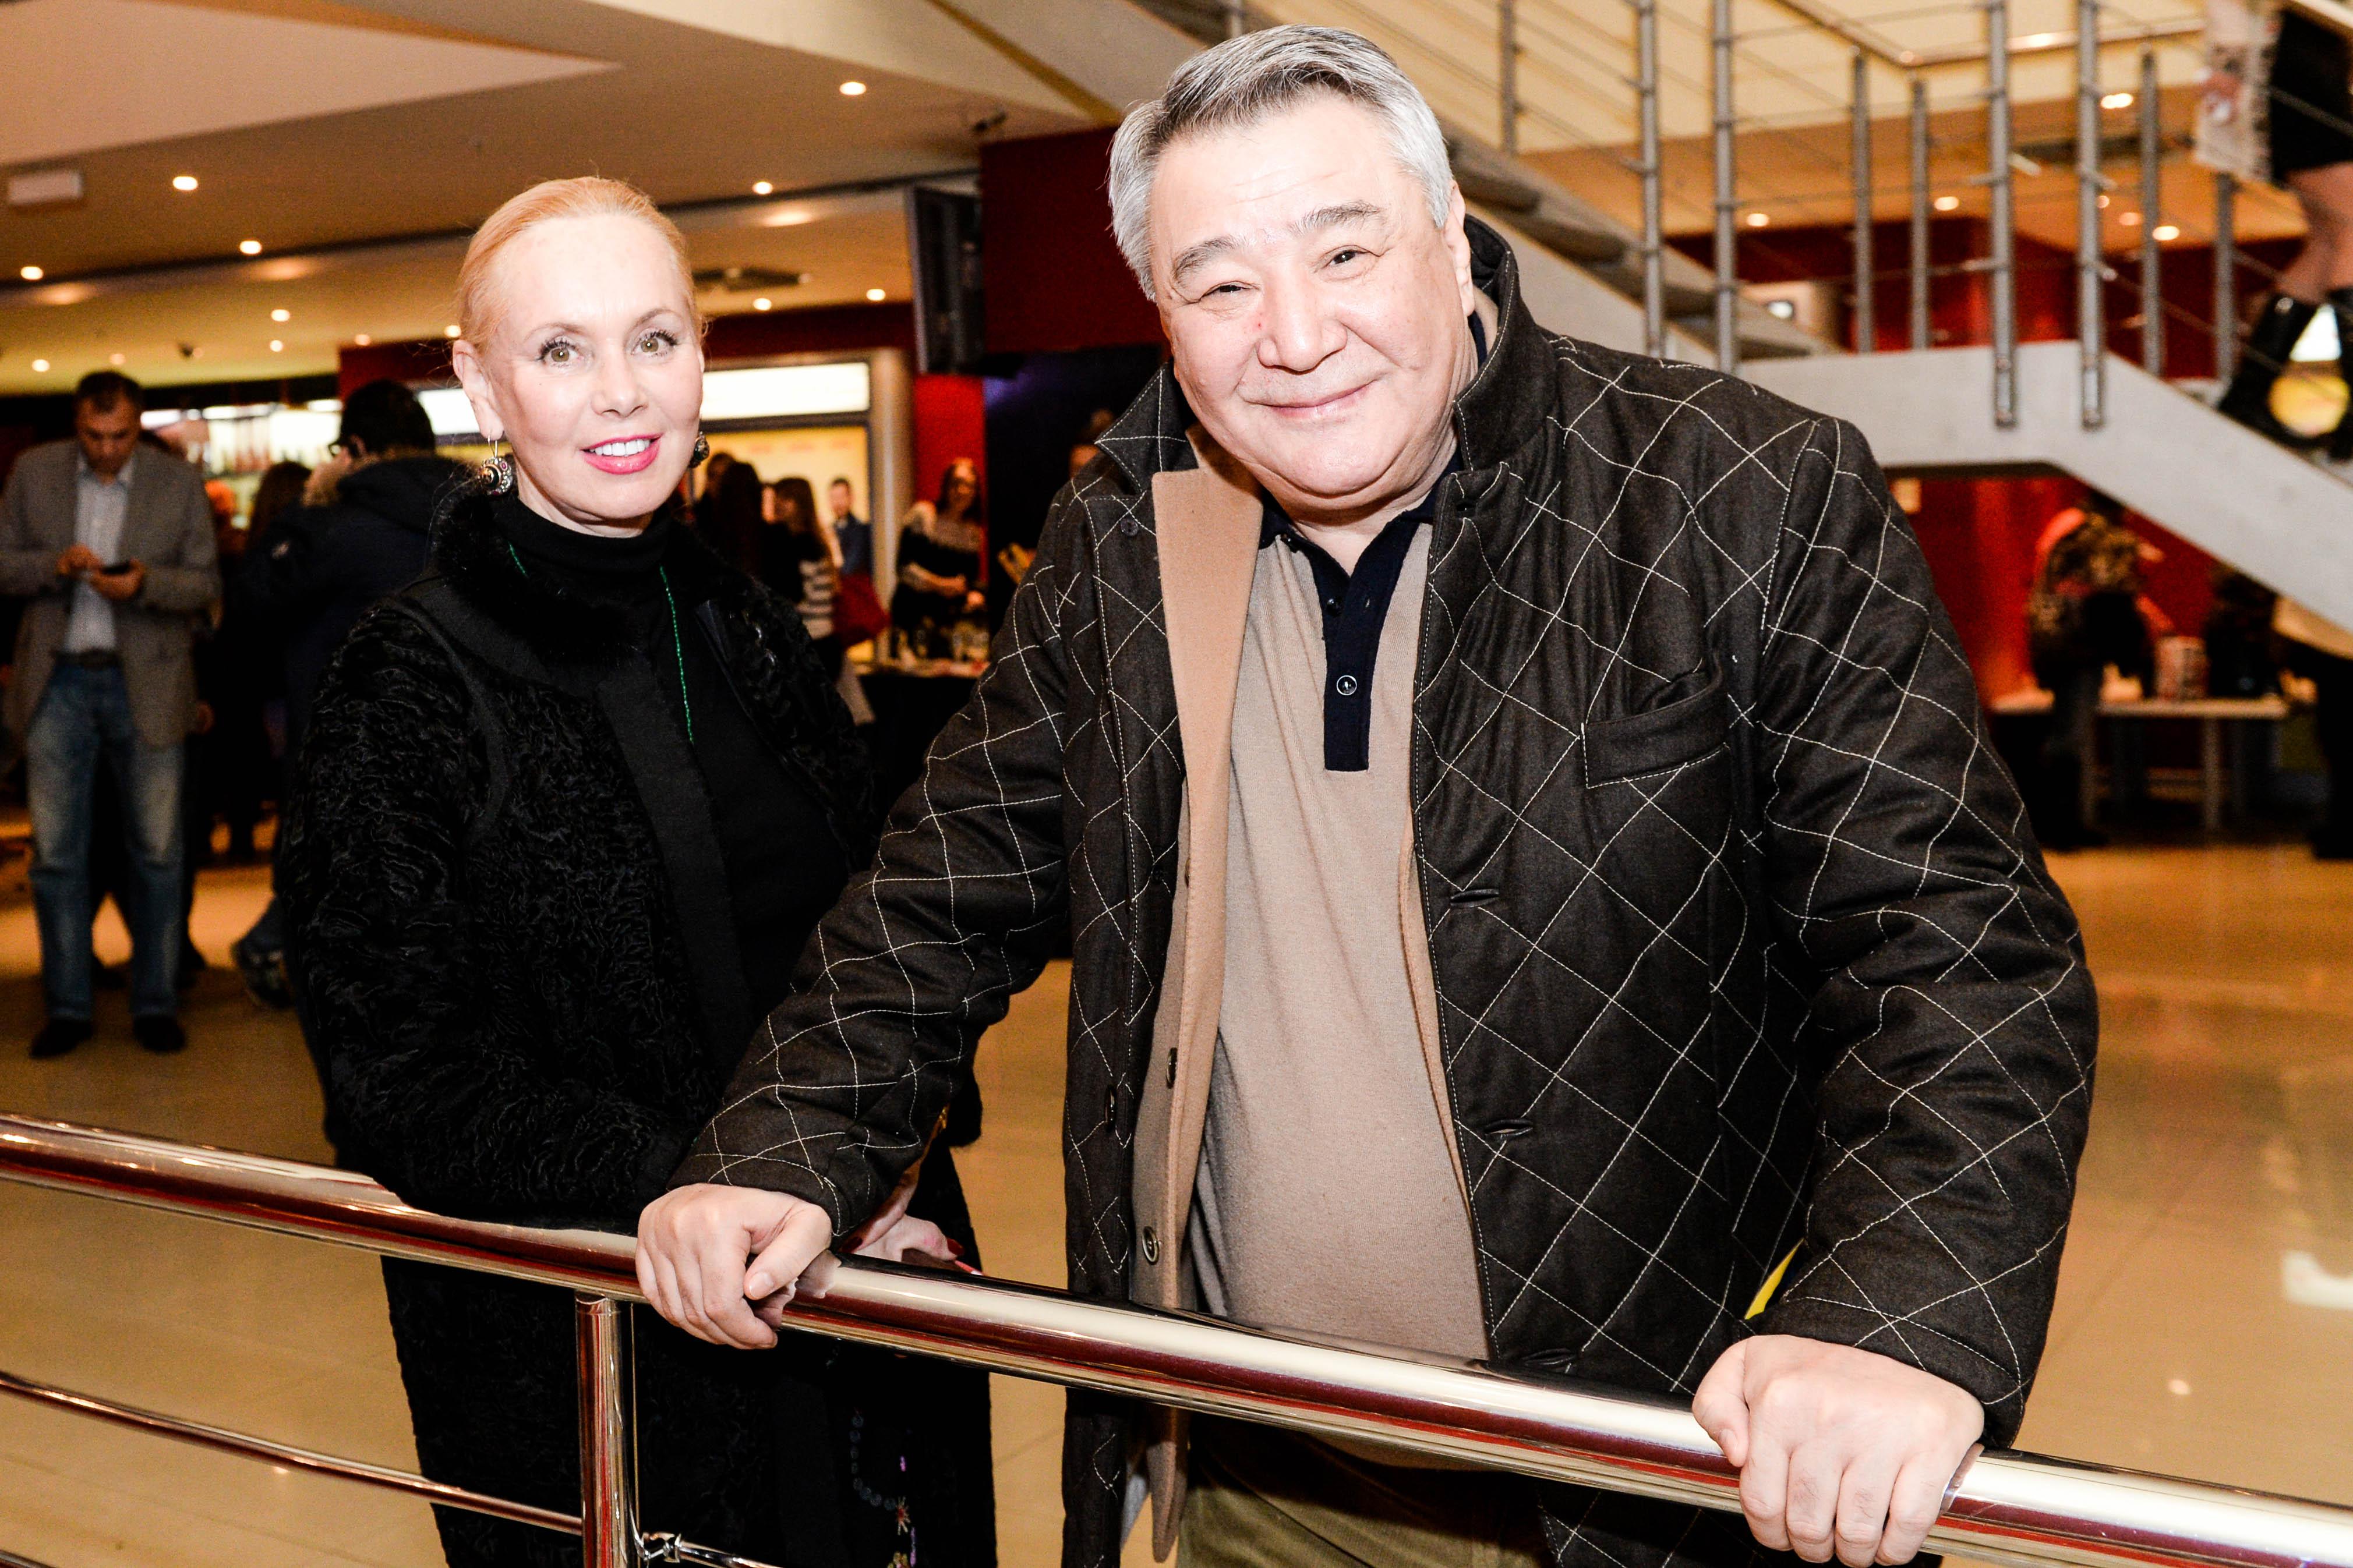 Нелли Кобзон и бизнесмен Алимжан Тохтахунов